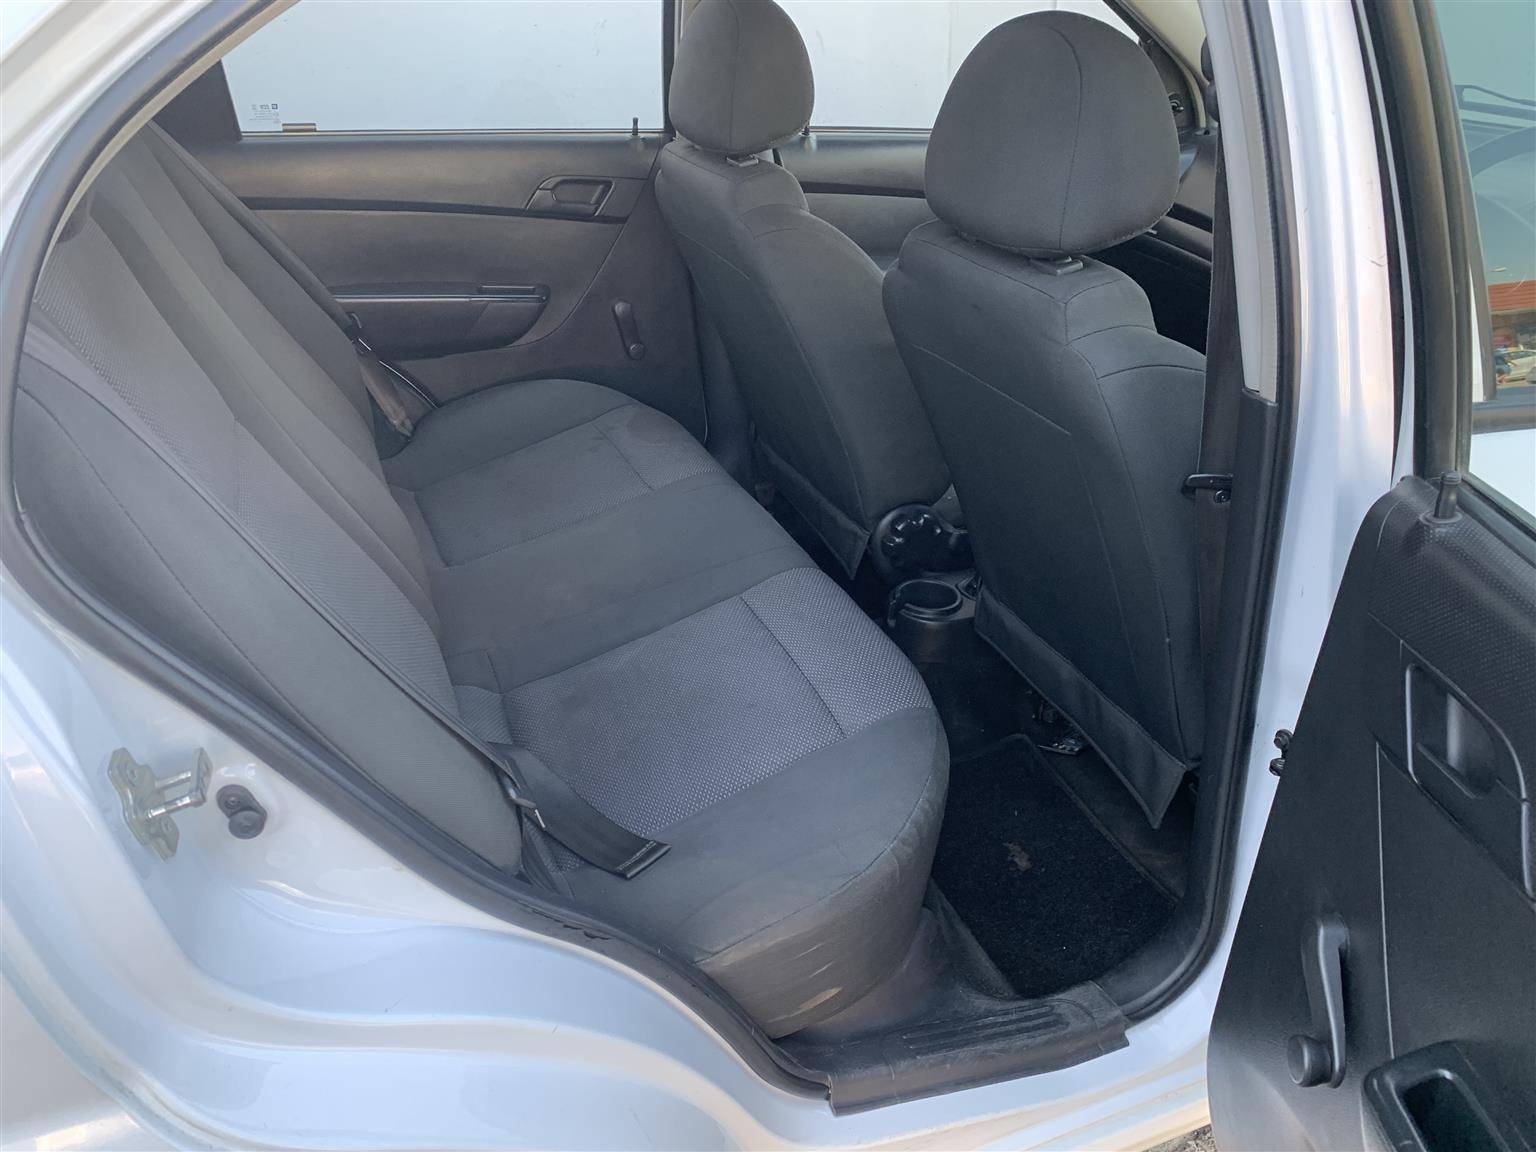 2015 Chevrolet Aveo 1.6 LS sedan